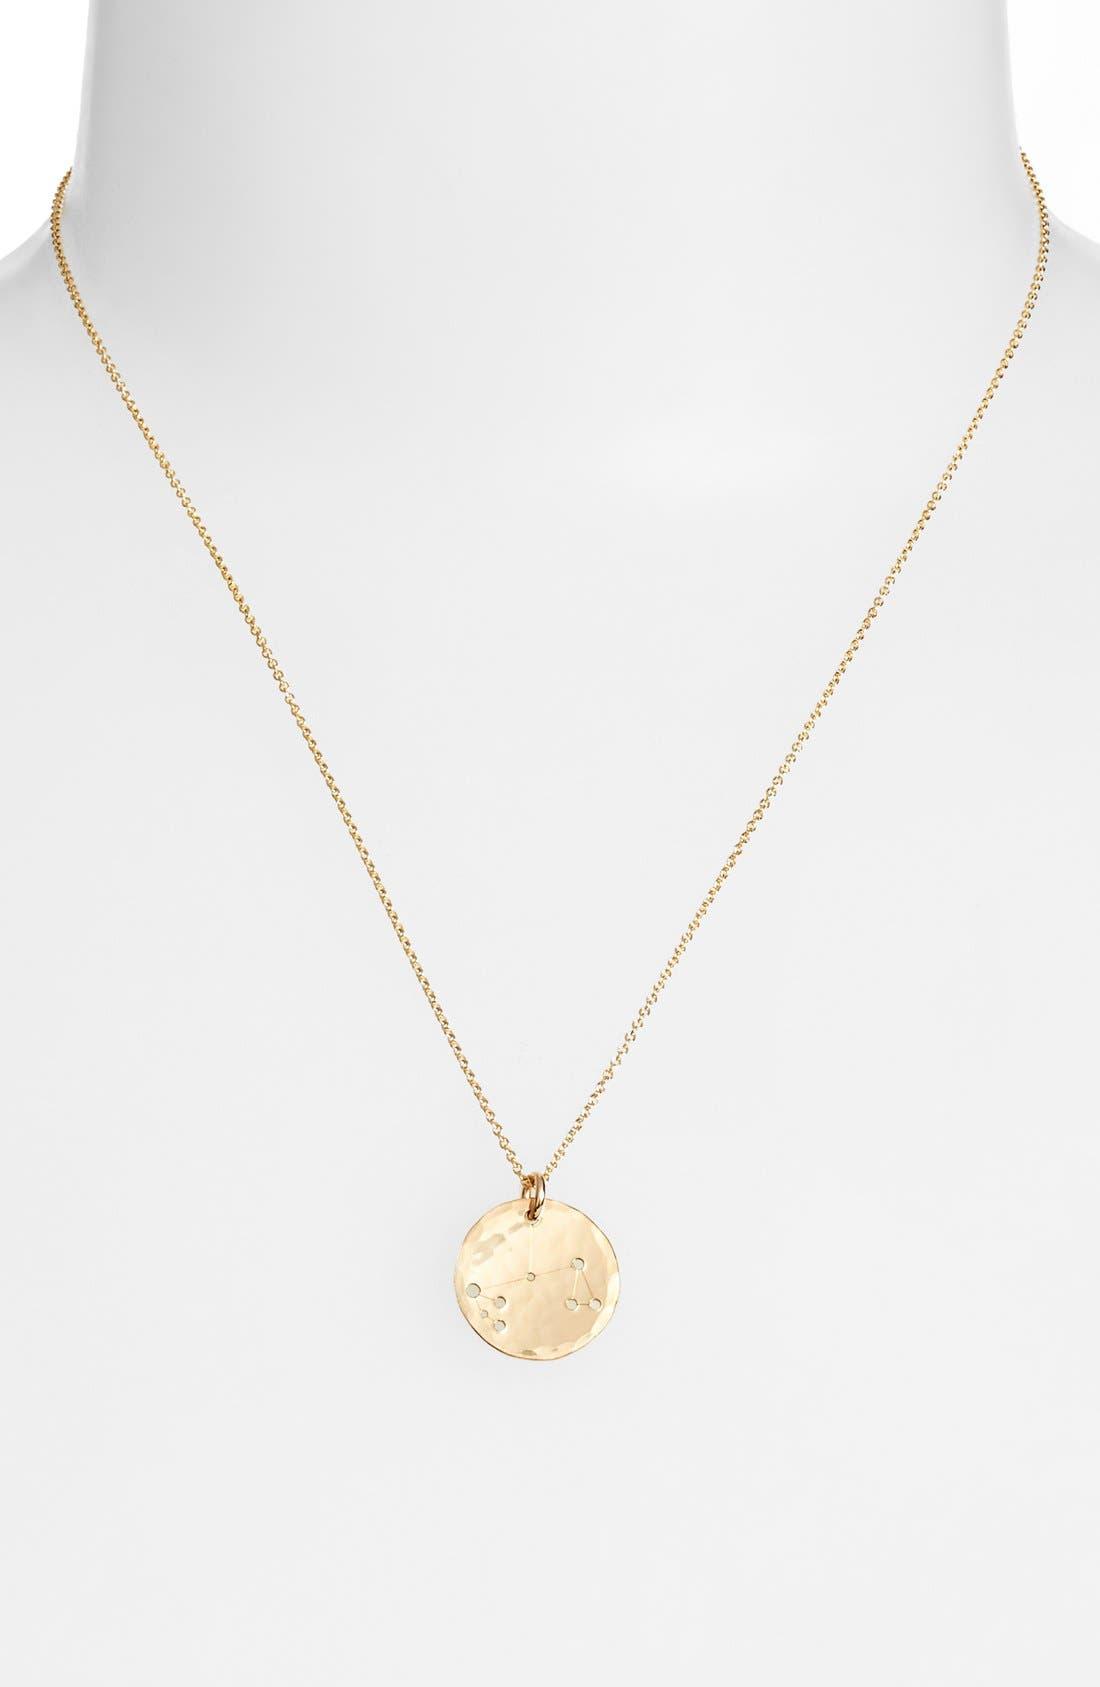 Ija 'Small Zodiac' 14k-Gold Fill Necklace,                             Alternate thumbnail 19, color,